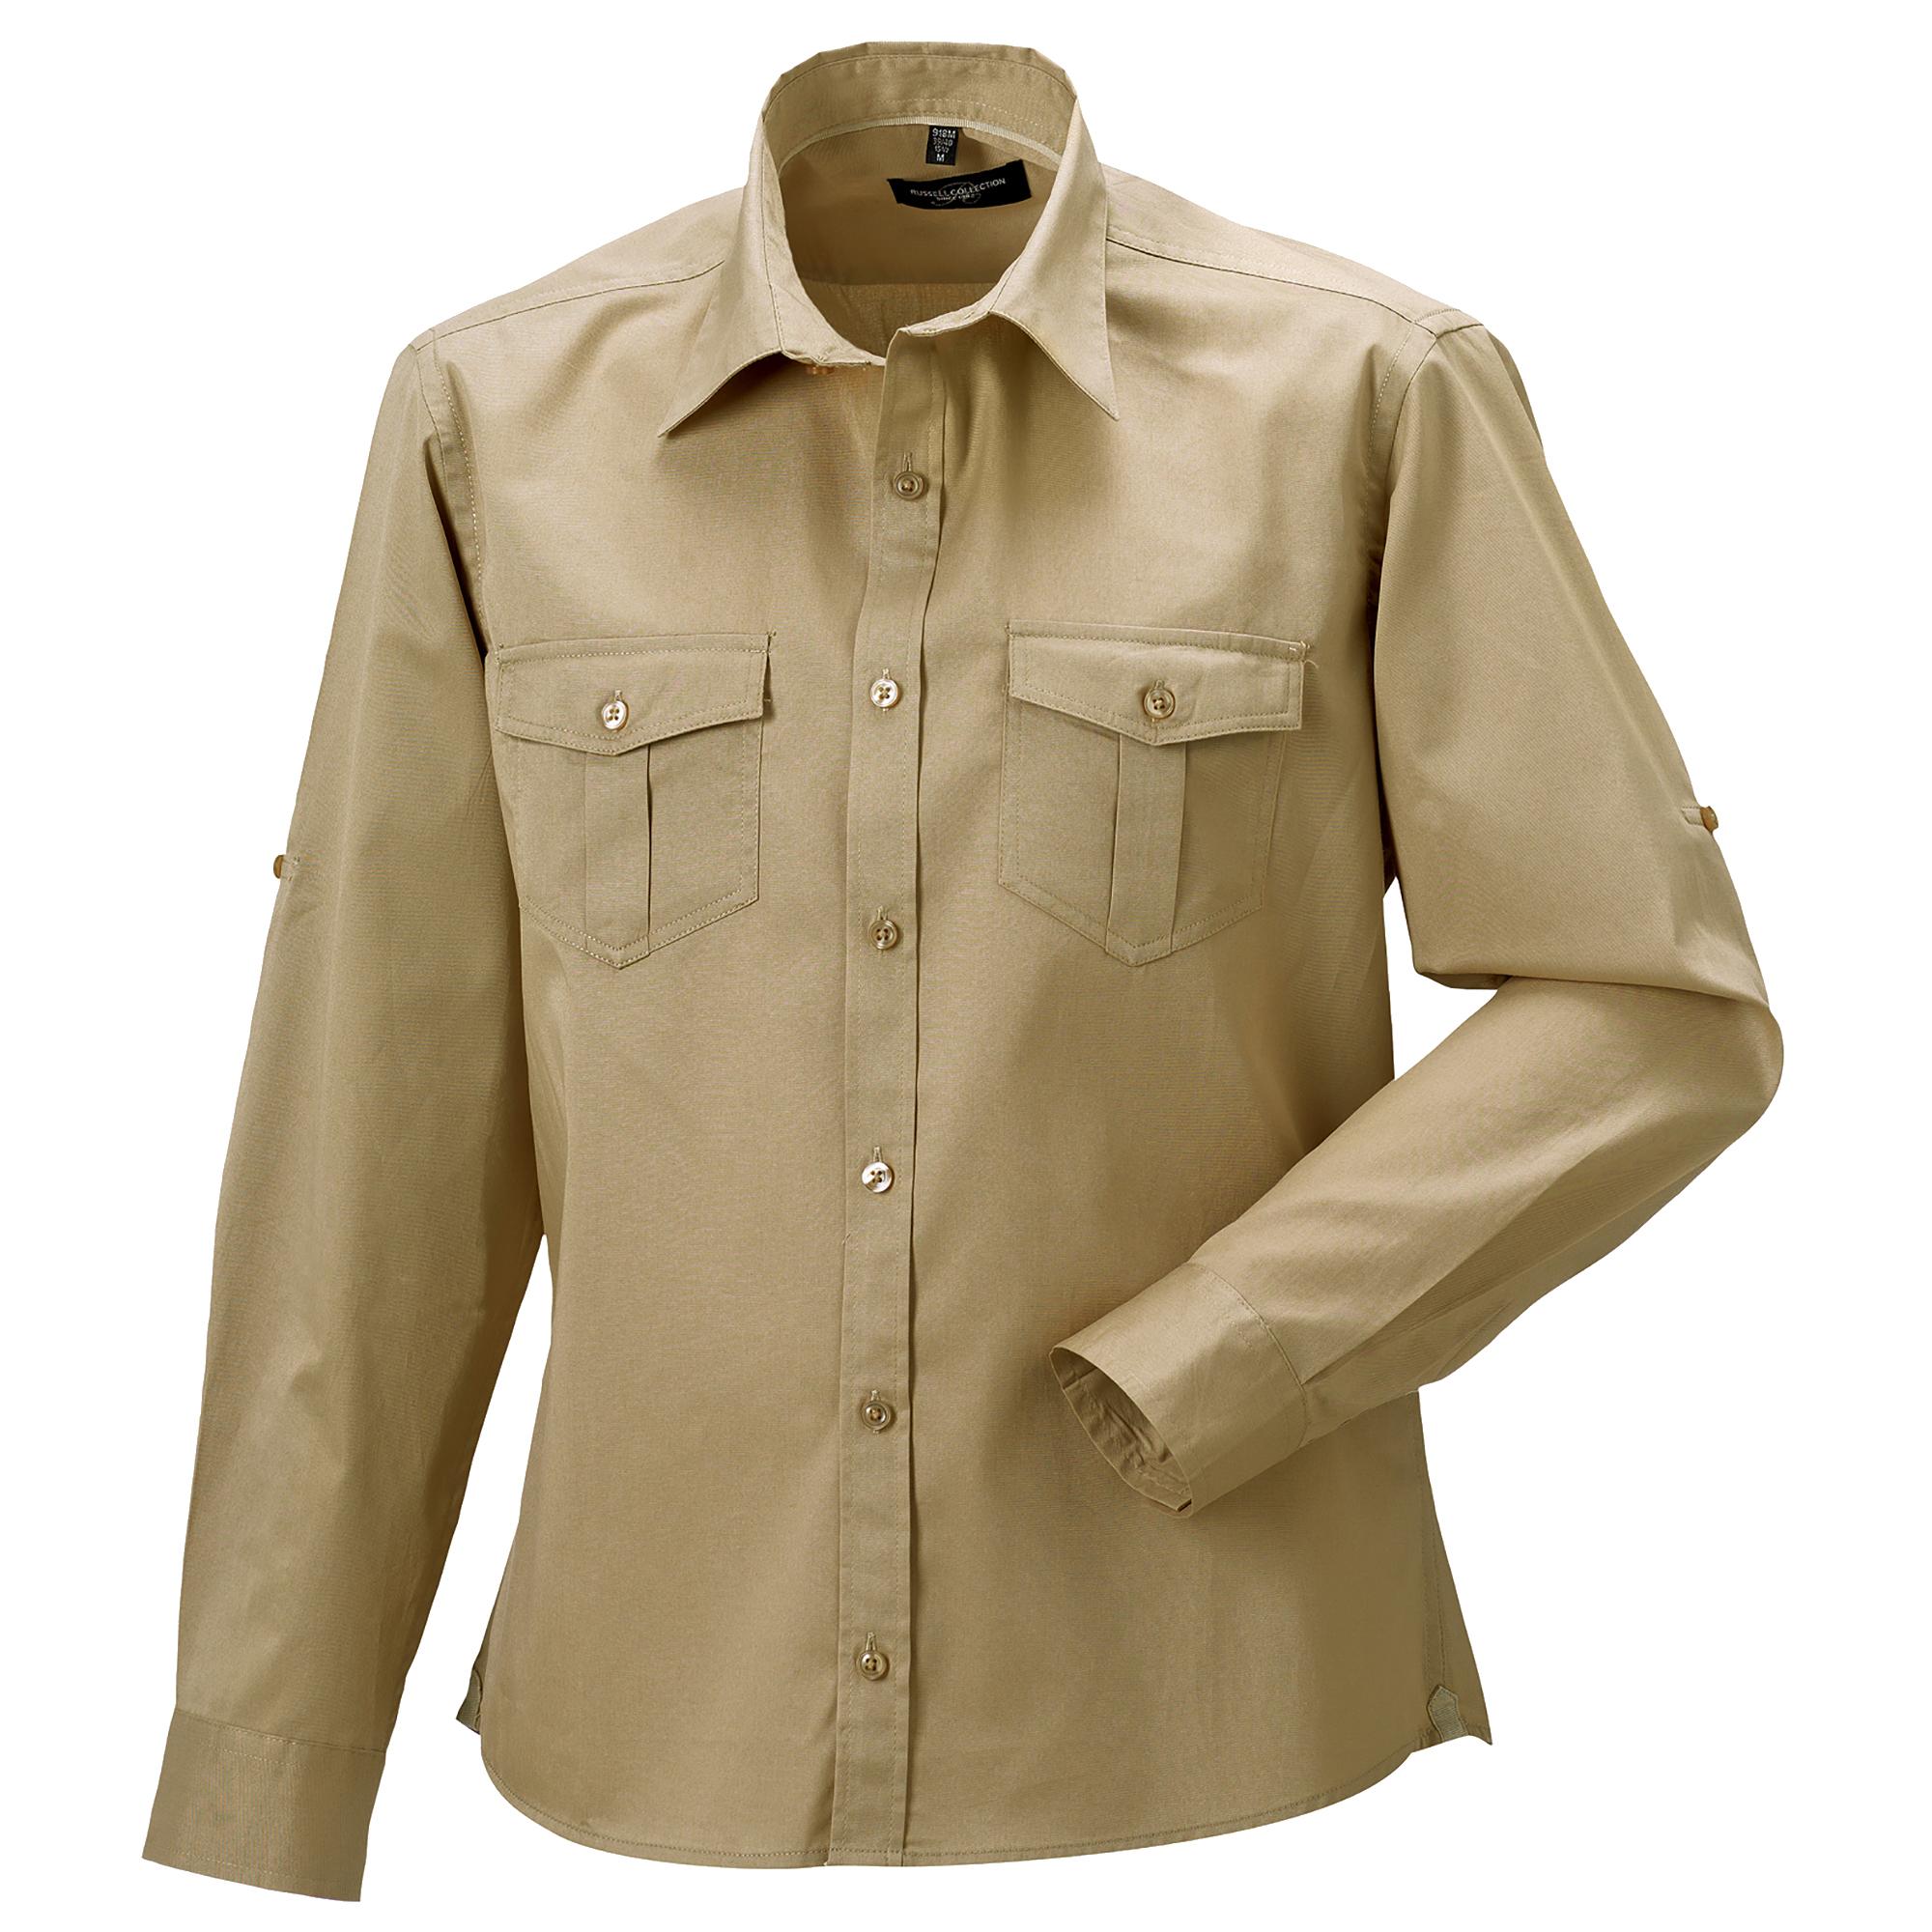 Russell Collection Mens Long / Roll-Sleeve Work Shirt (3XL) (Khaki)